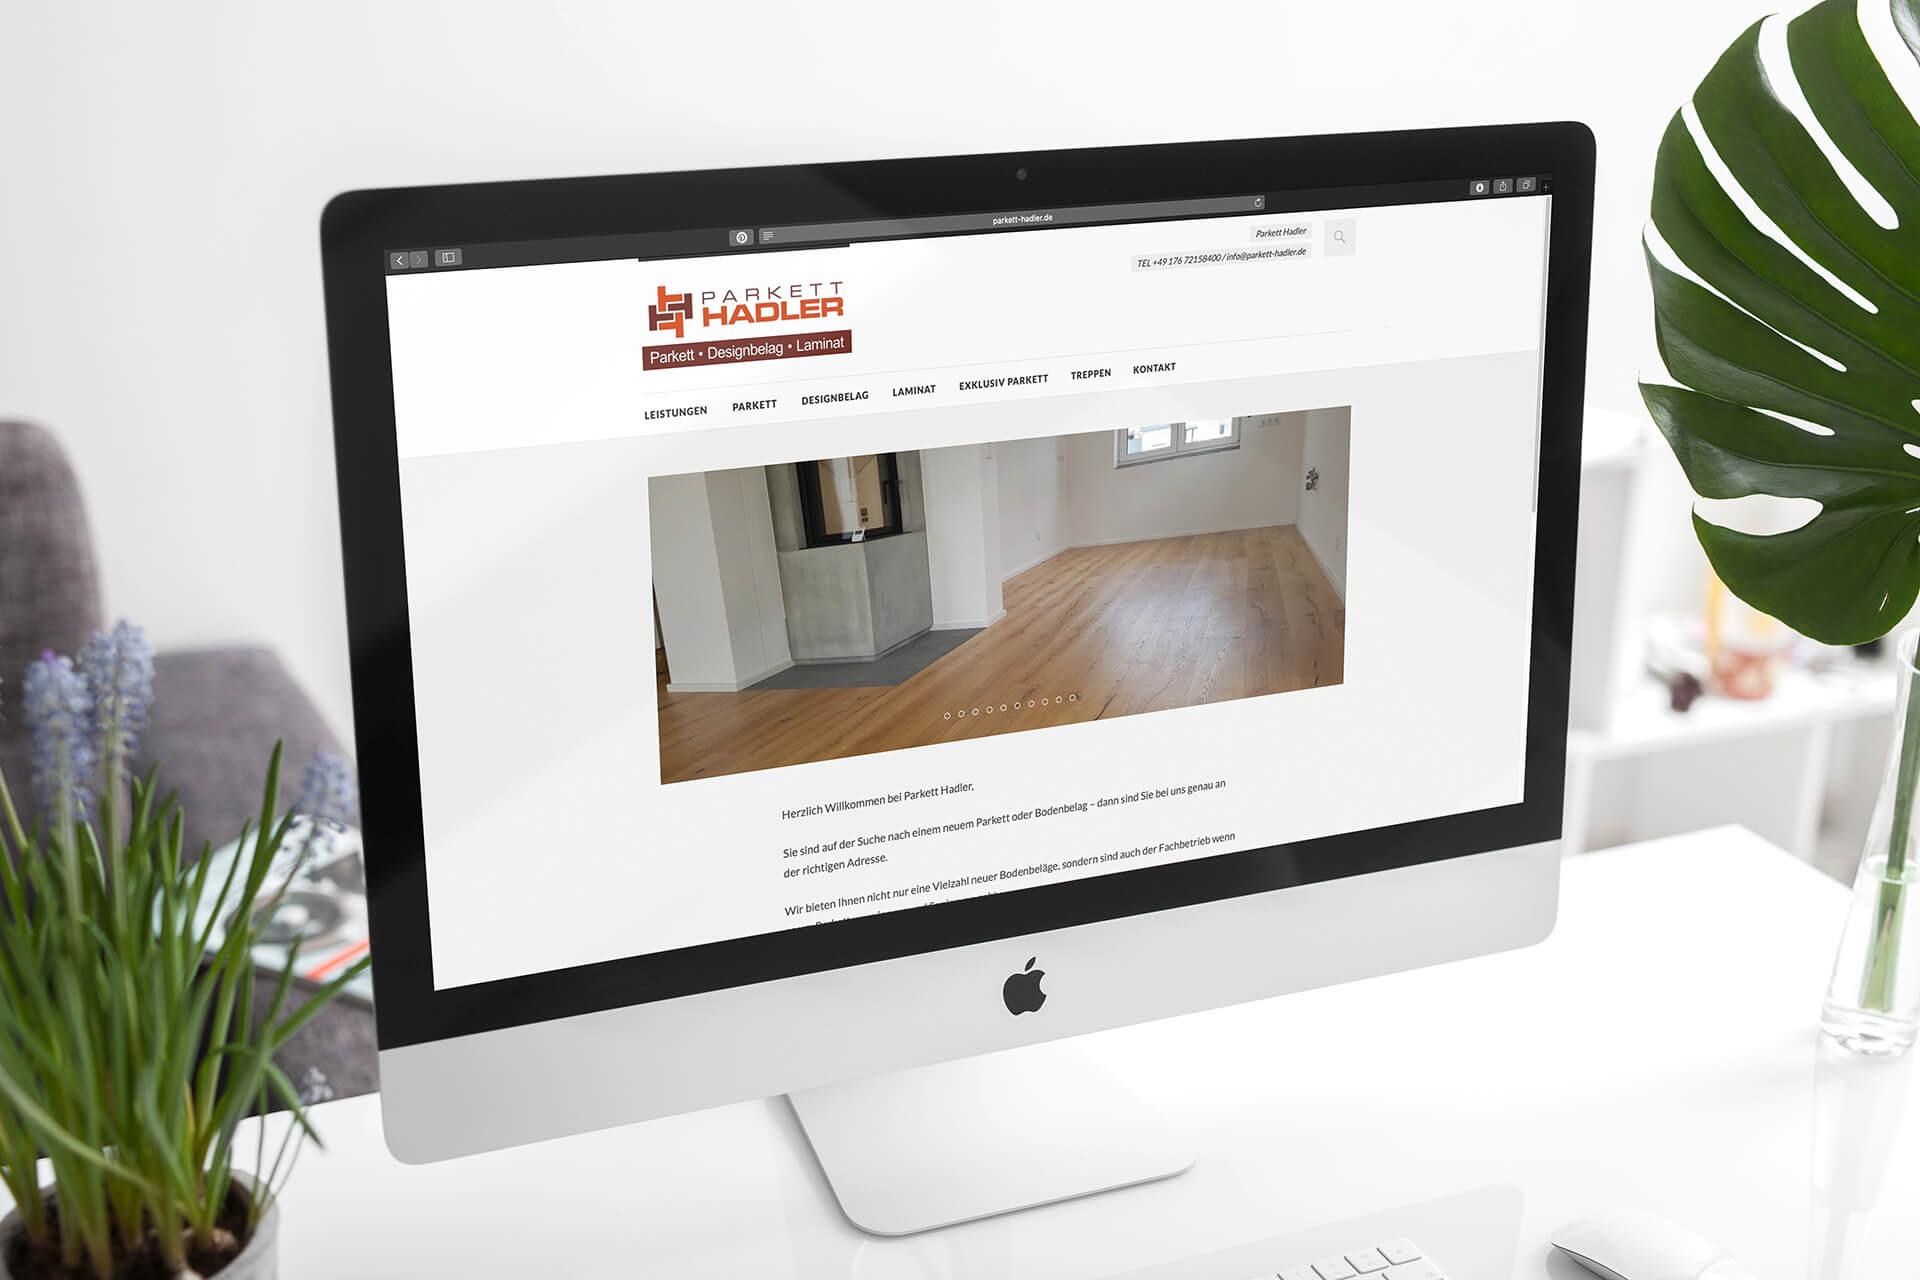 gniced-daniel gross-pfaffenhofen-grafikdesign-digital-webdesign-webentwicklung-7